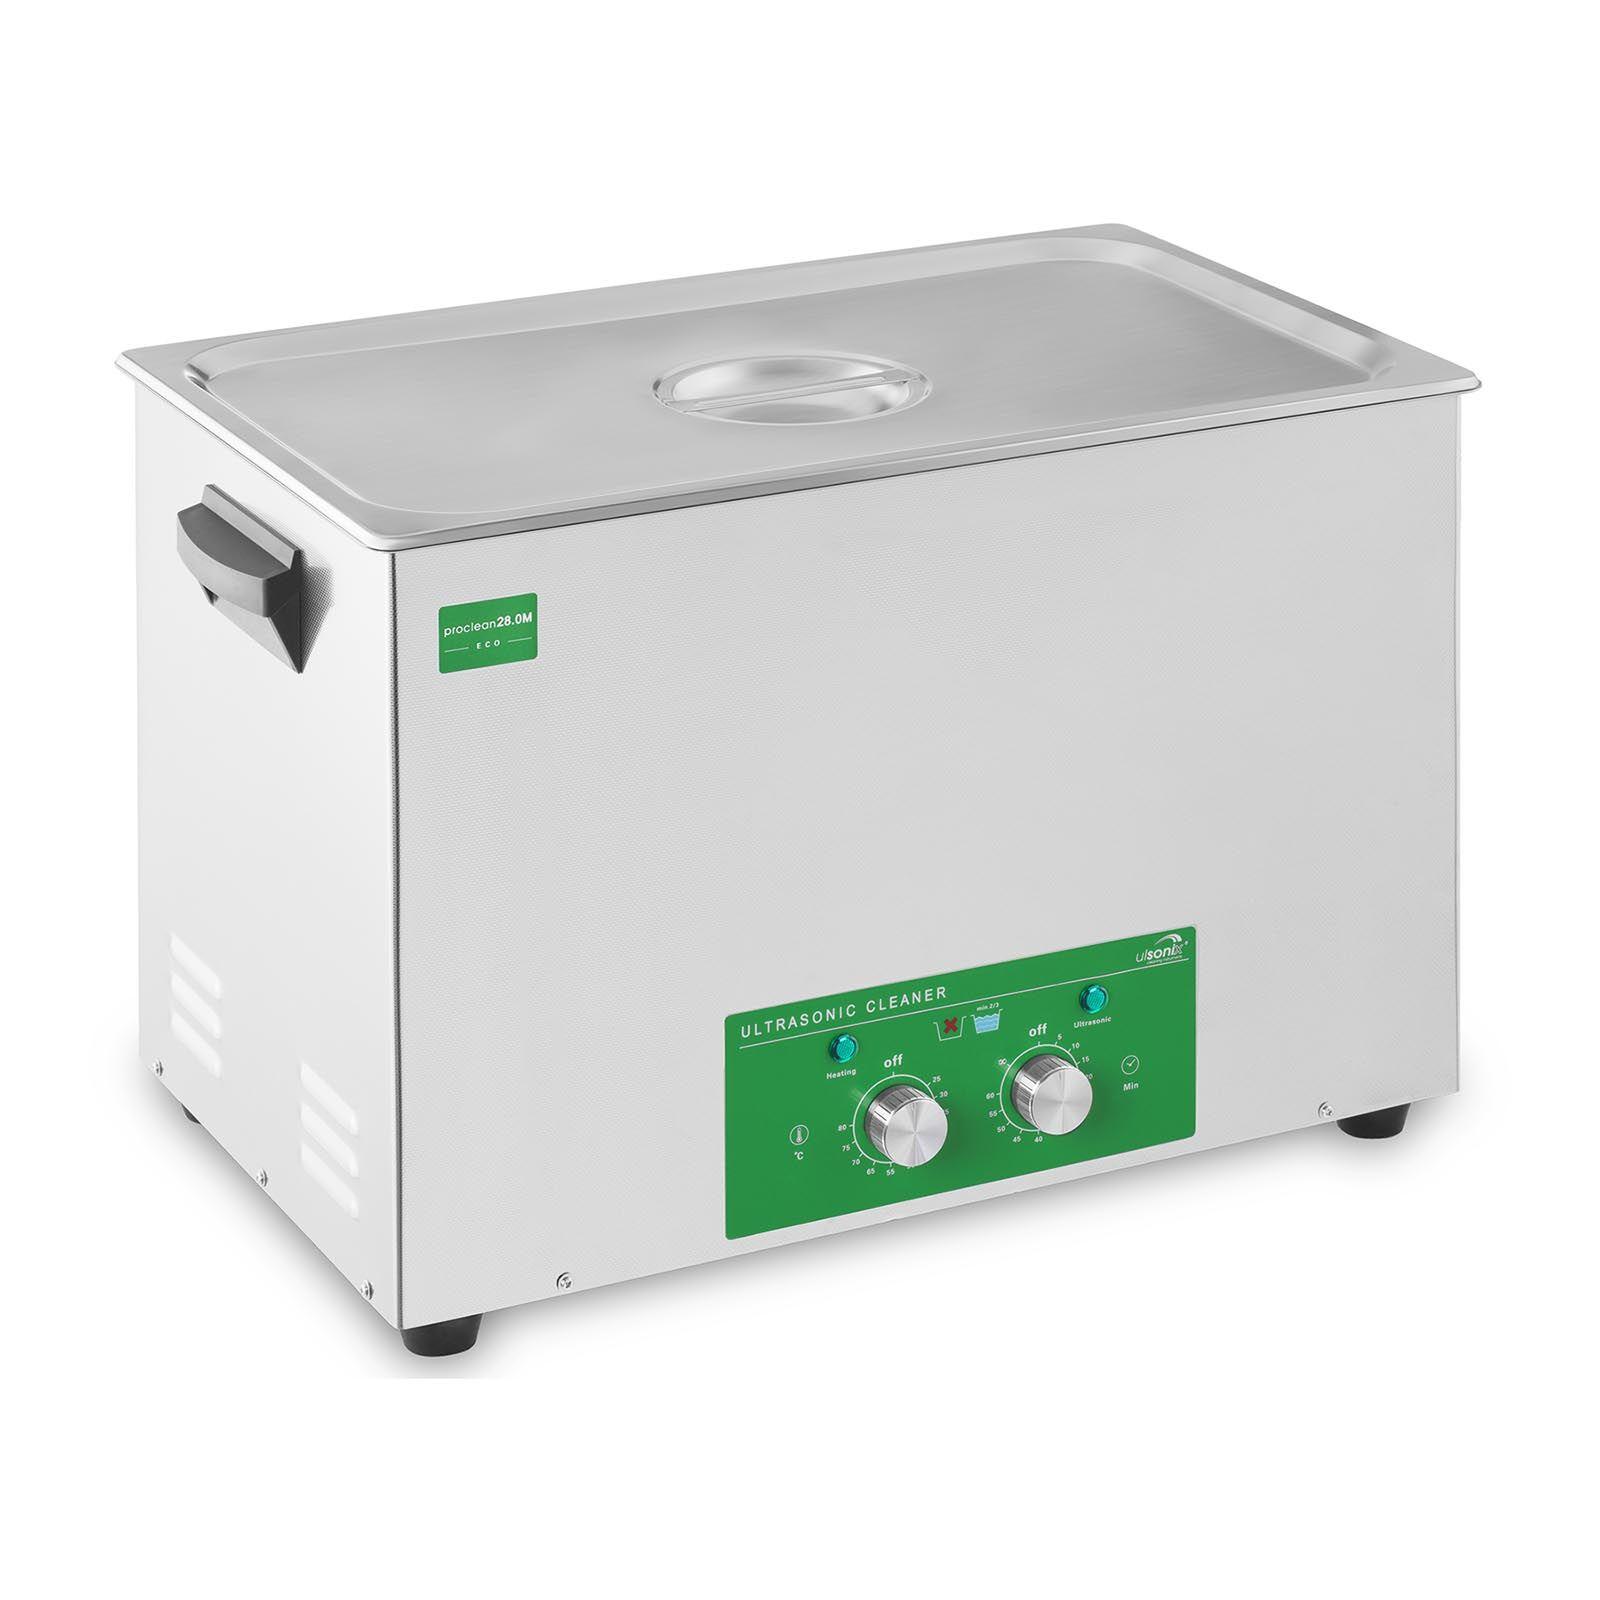 ulsonix Nettoyeur ultrason - 28 litres - 480 watts - Basic Eco PROCLEAN 28.0M ECO